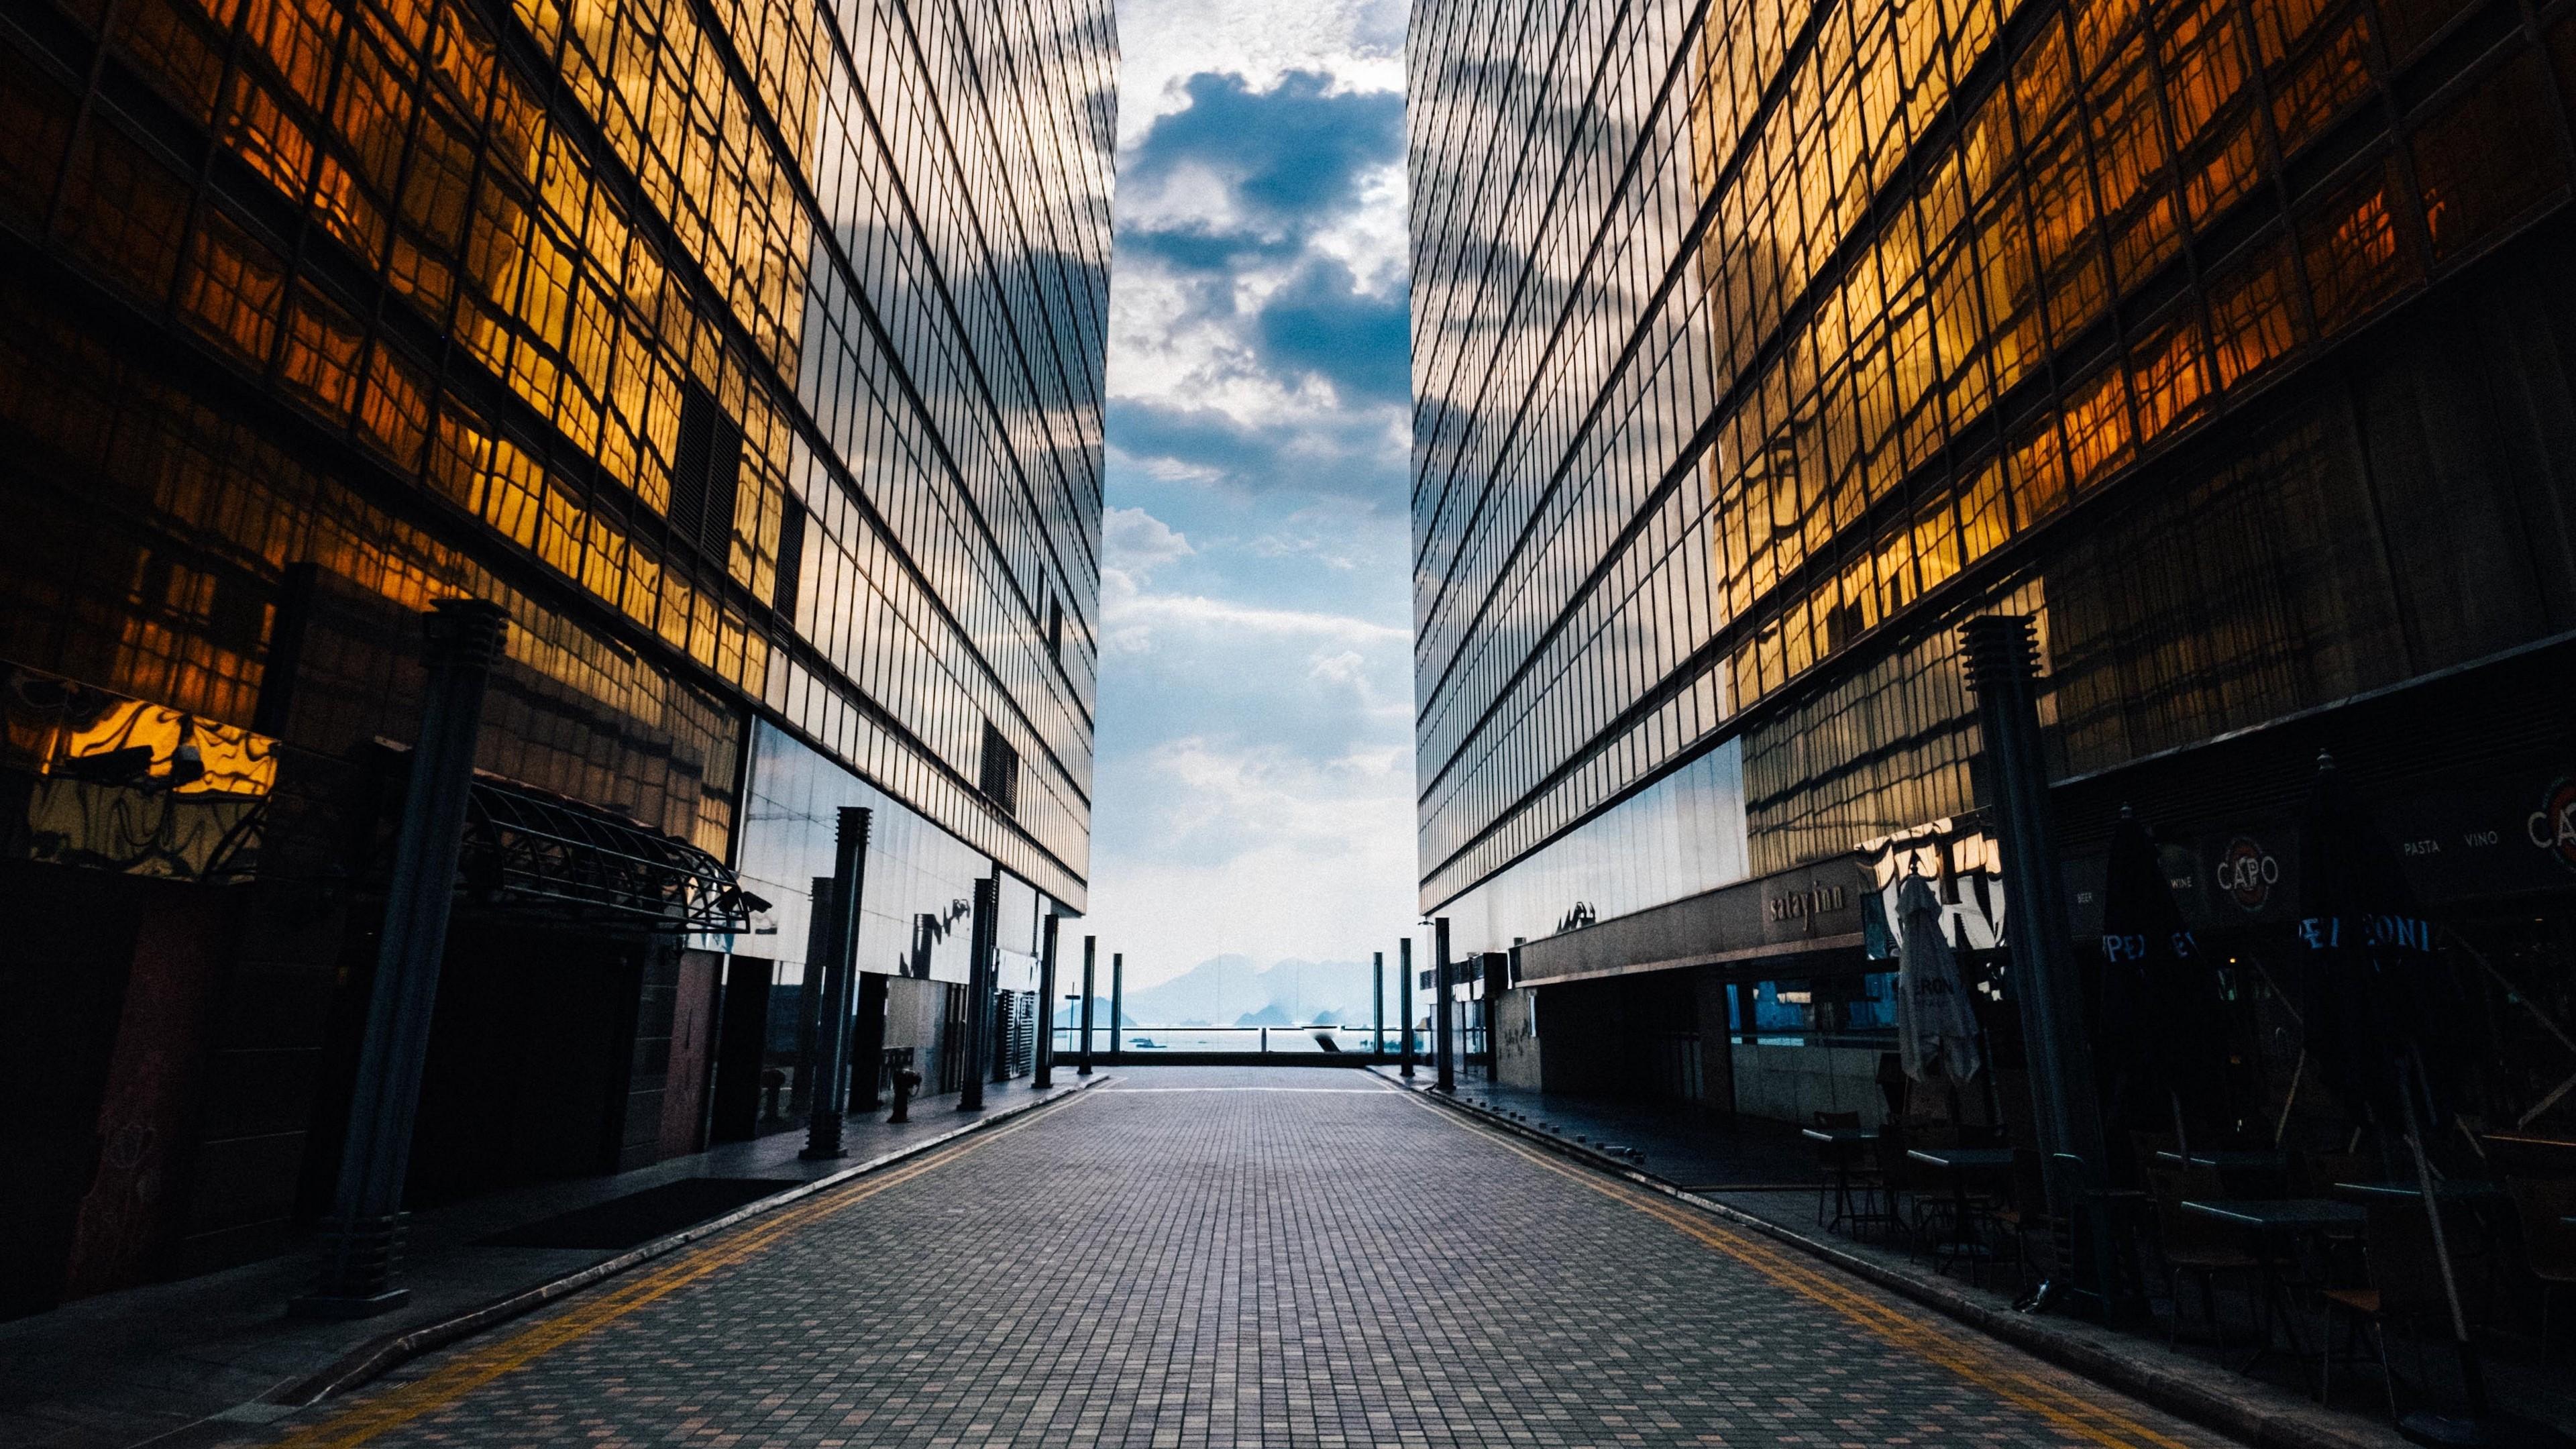 4k Buildings Facade Glass Wallpaper 3840x2160